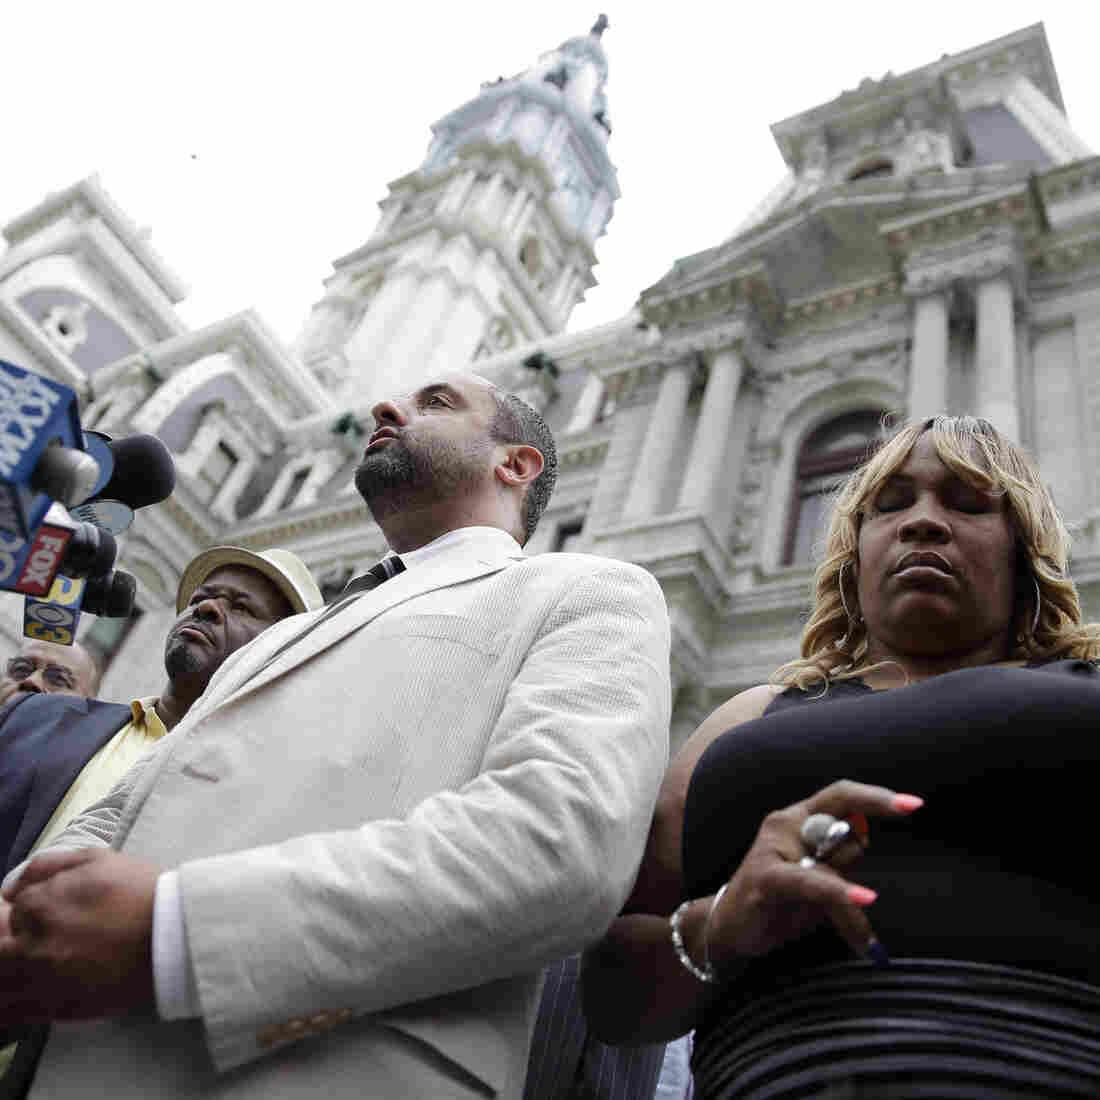 Building Trust, Or Danger? Debate Over Naming Officers After Shootings